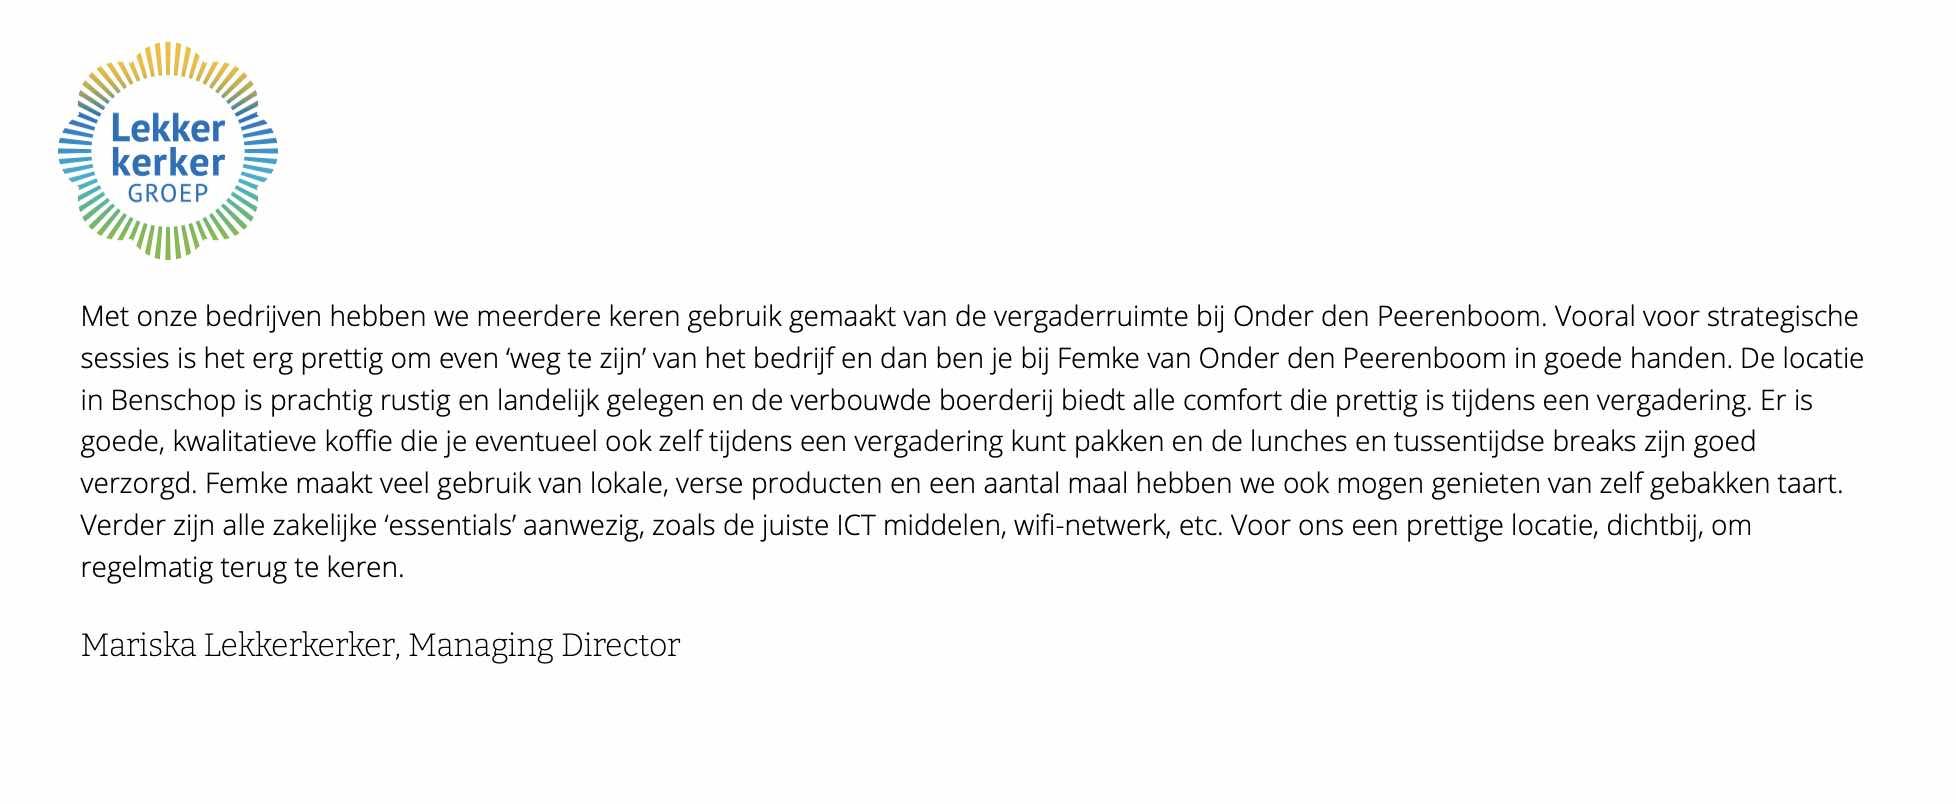 Referentie Lekkerkerker_2